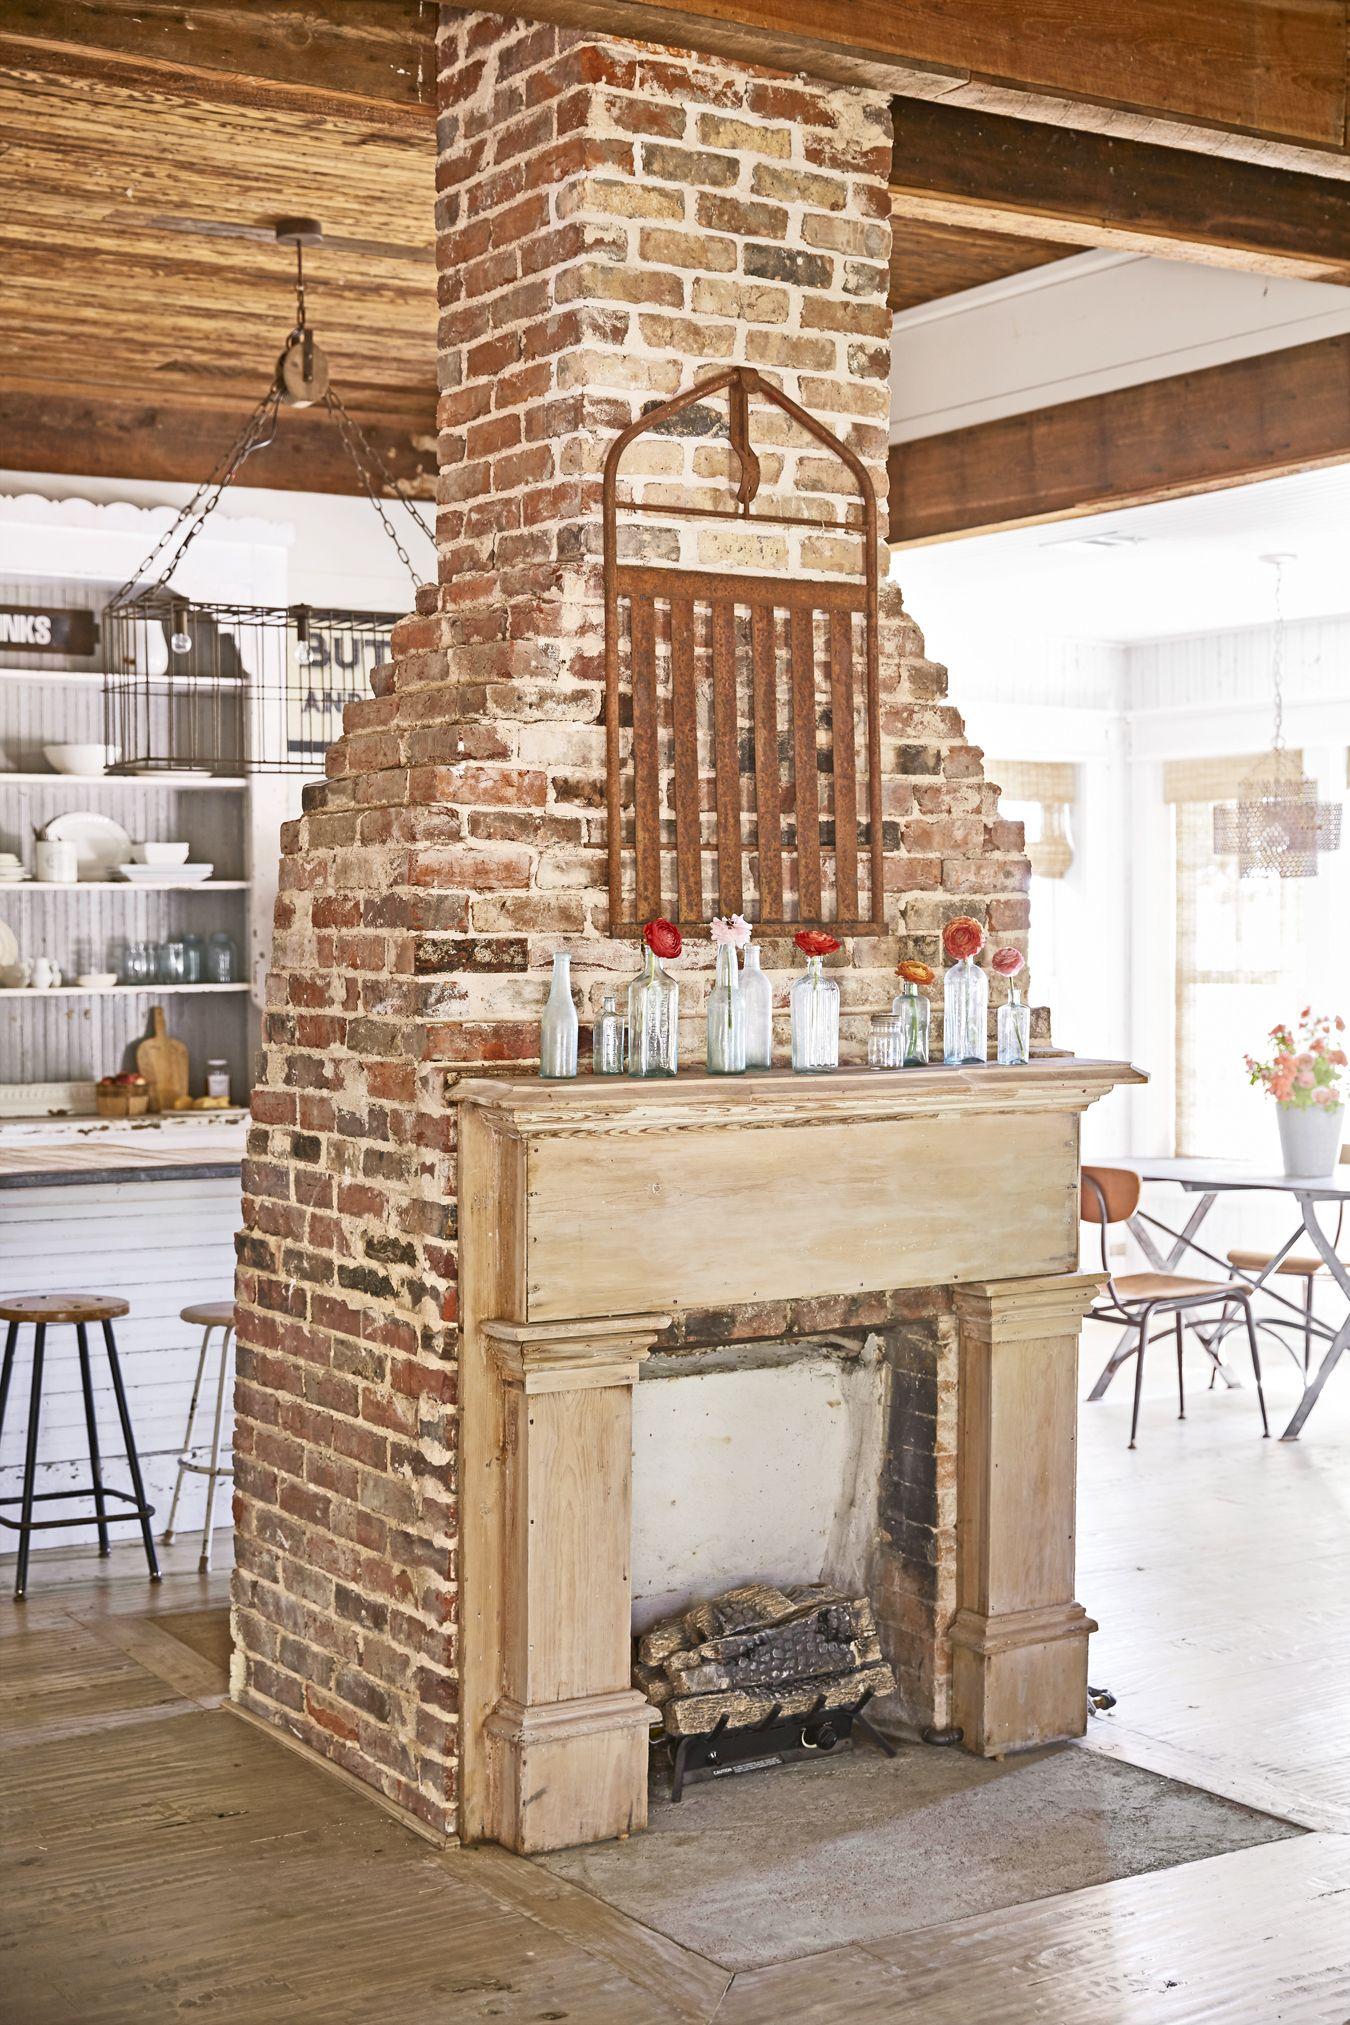 image & 40+ Fireplace Design Ideas - Fireplace Mantel Decorating Ideas